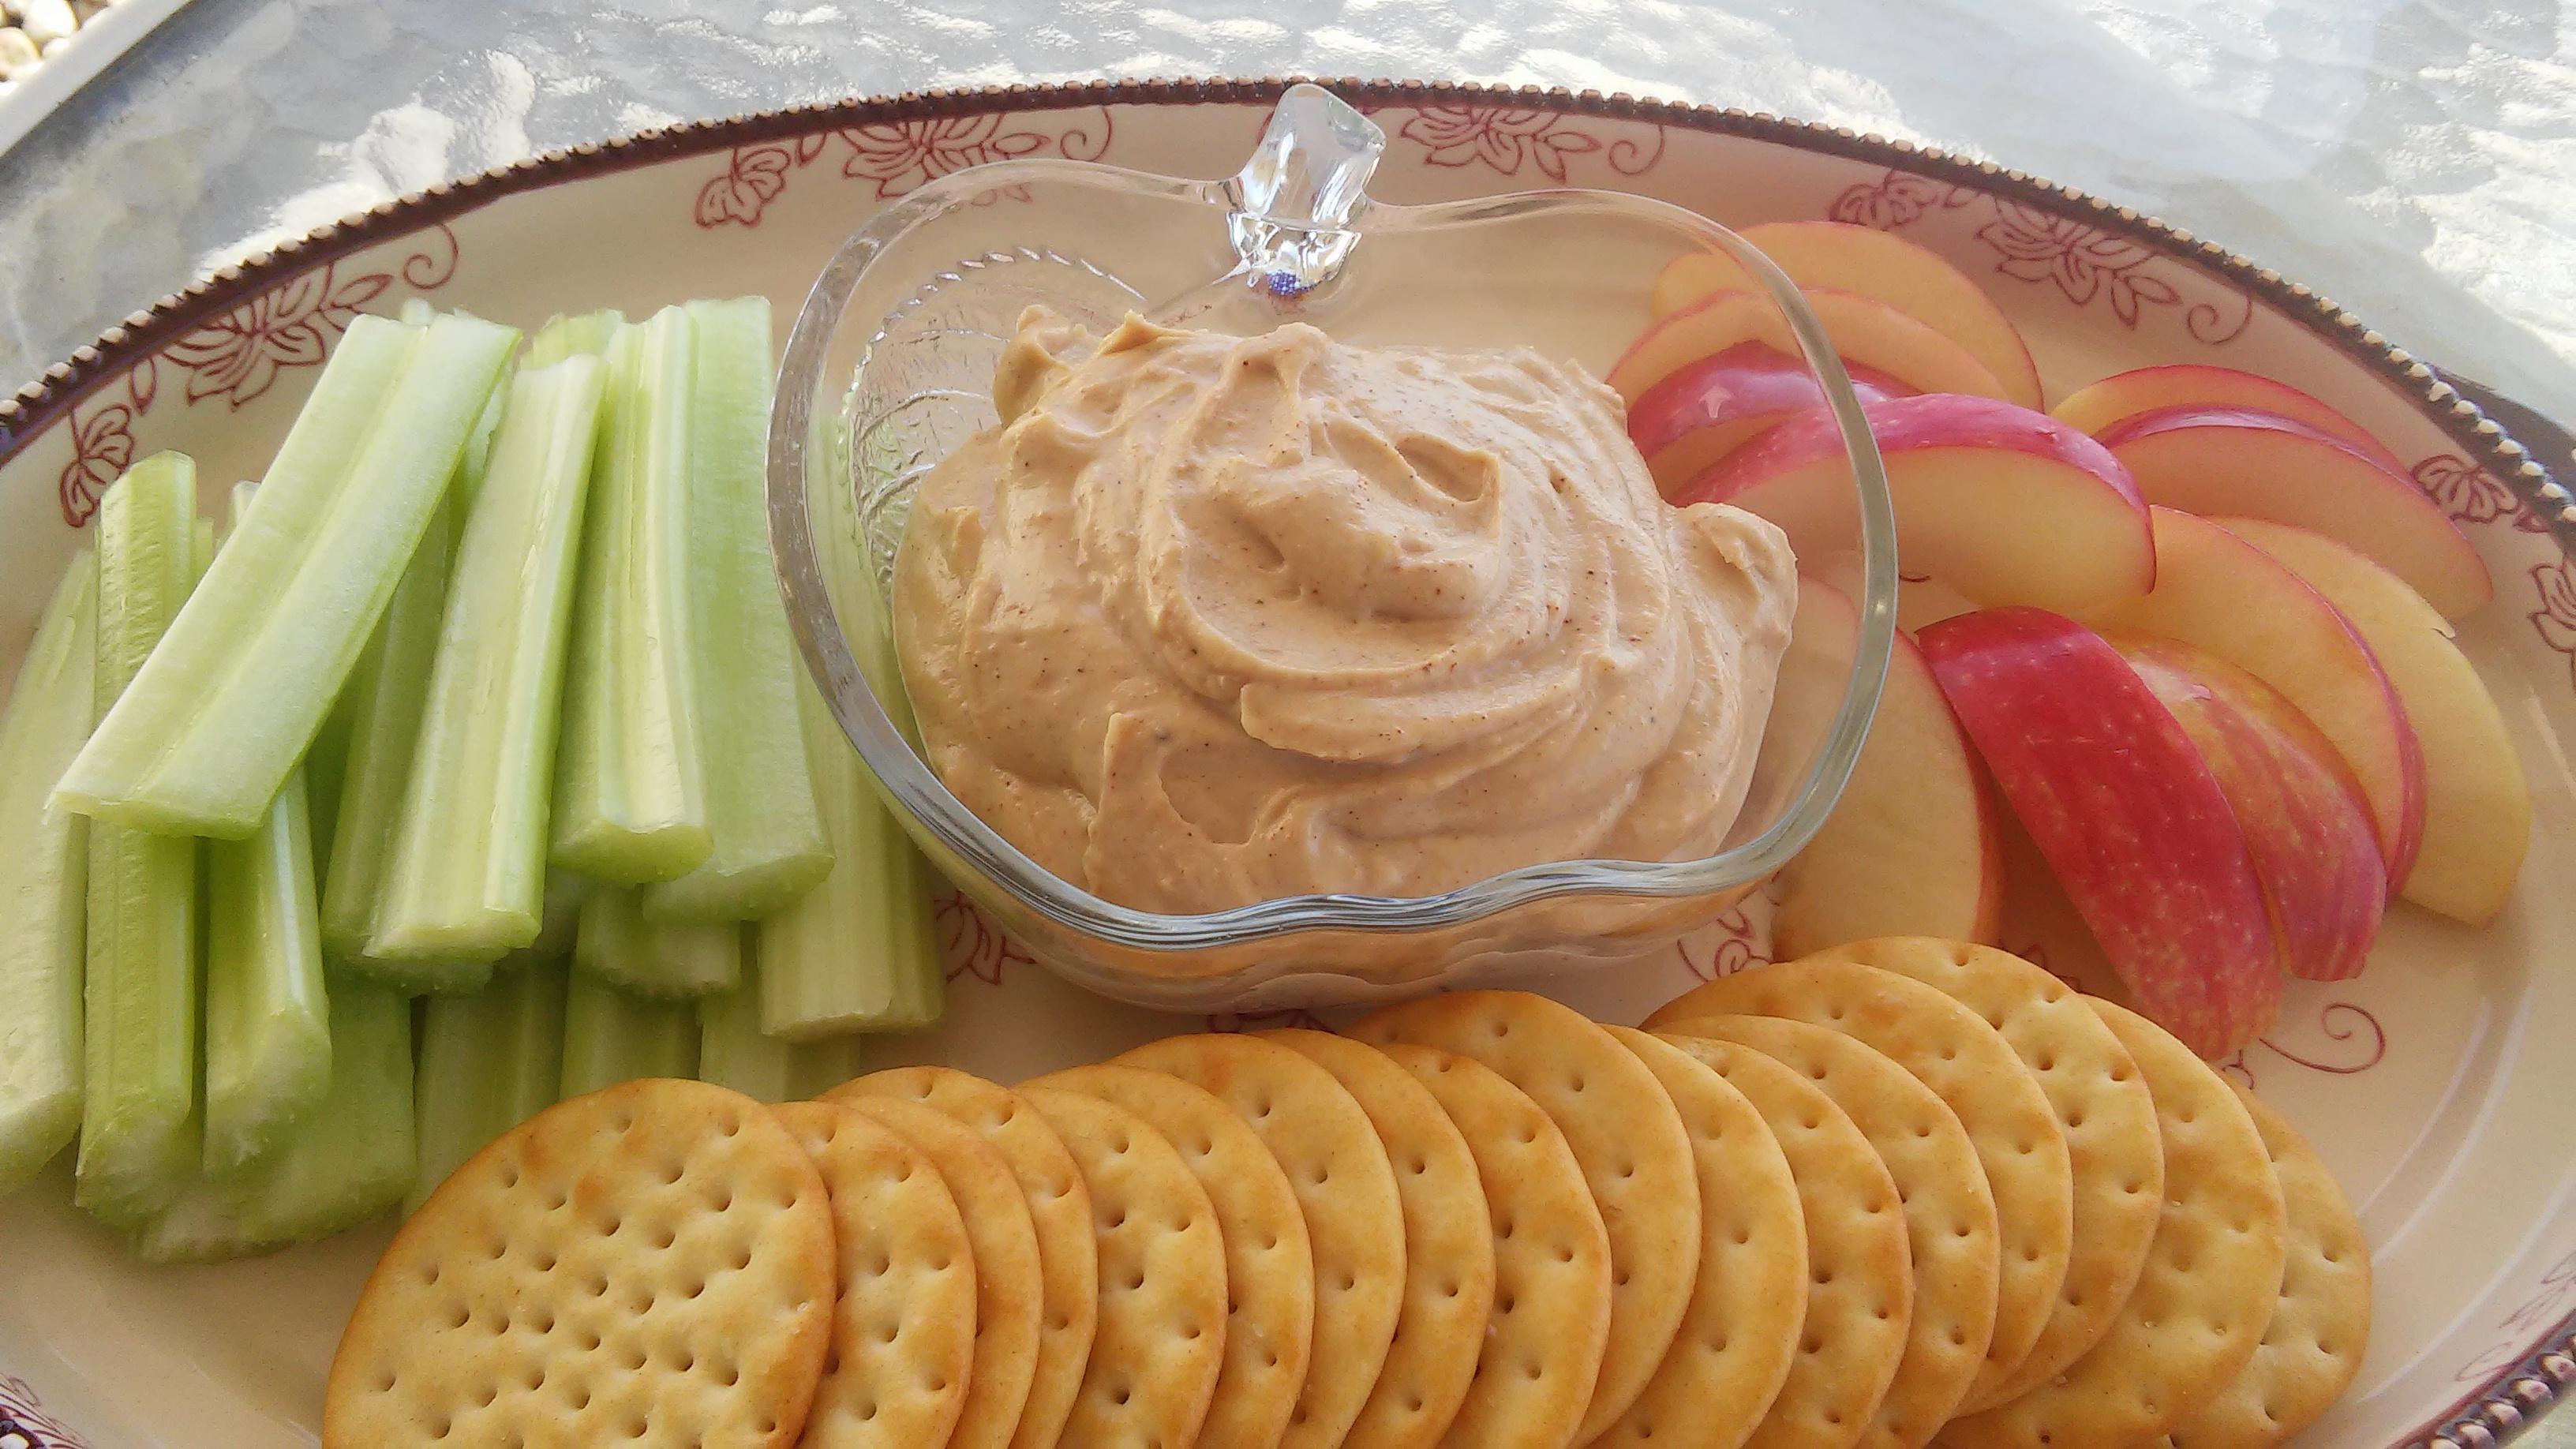 Spiced Peanut Butter Yogurt Dip Tammy Lynn